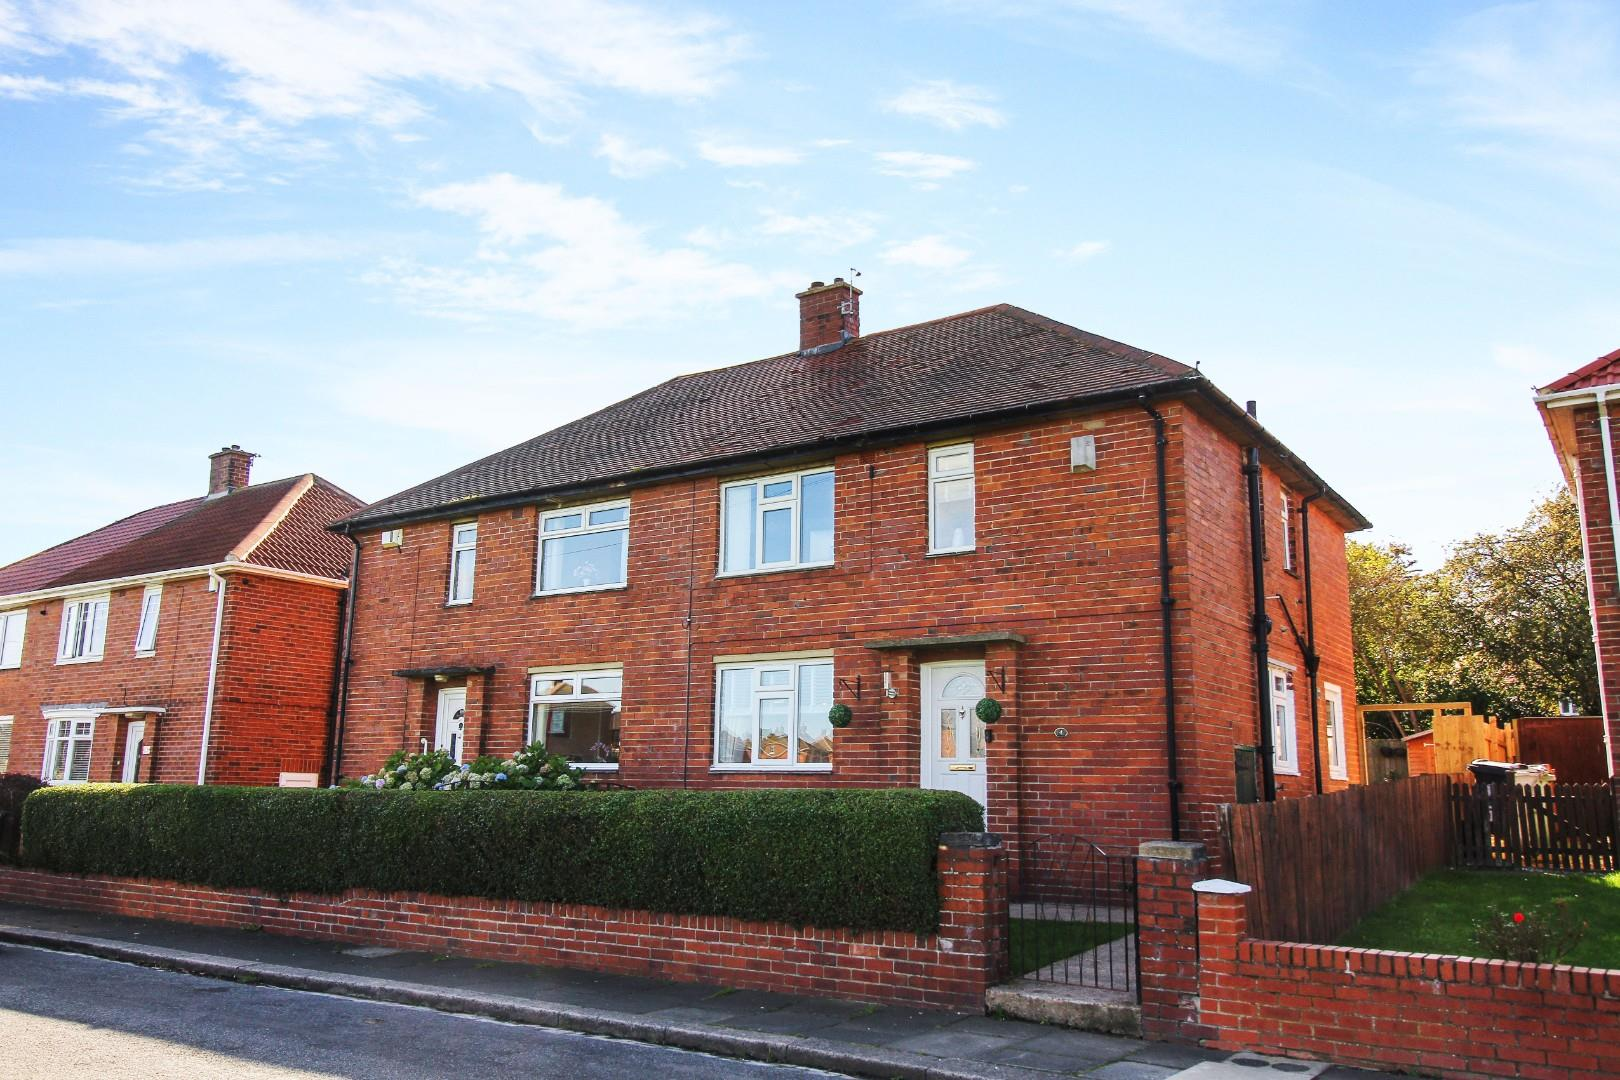 3 House - Semi-Detached